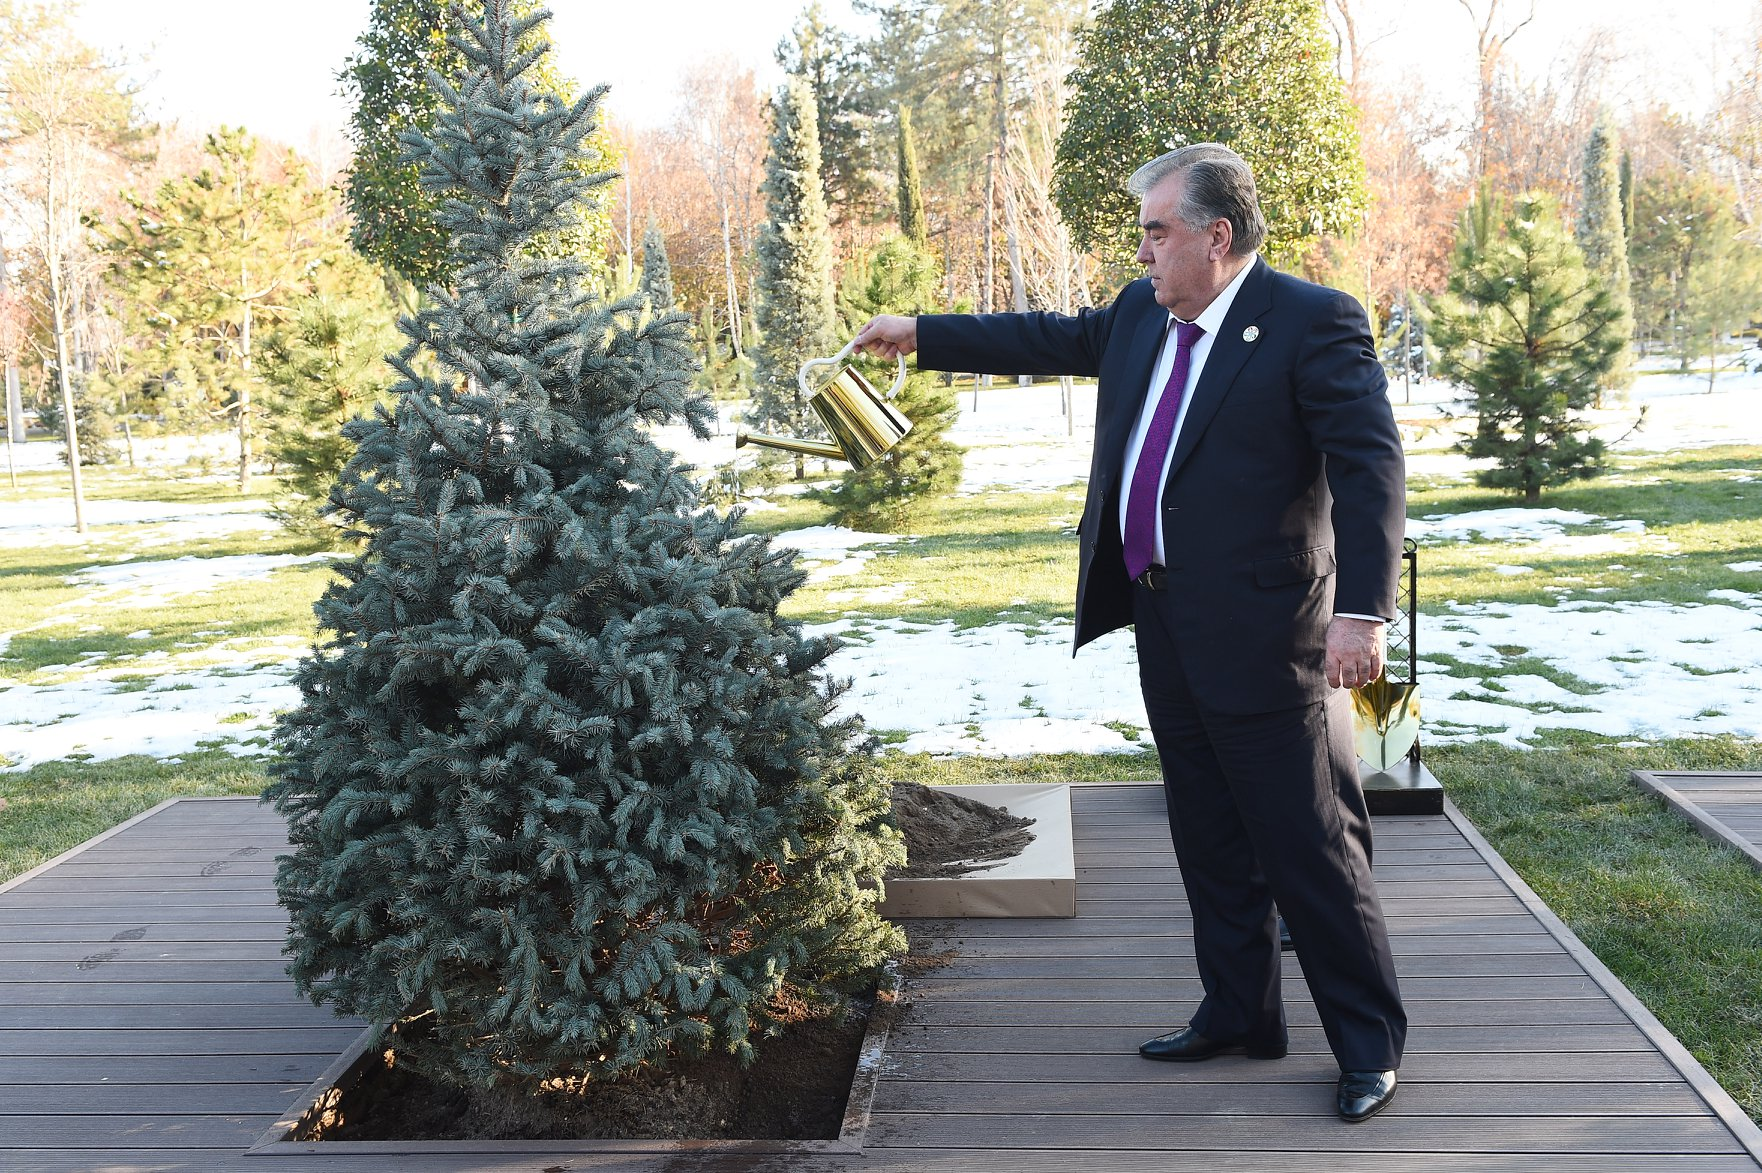 arbre plantation symbole tadjikistan Asie centrale sommet Tachkent